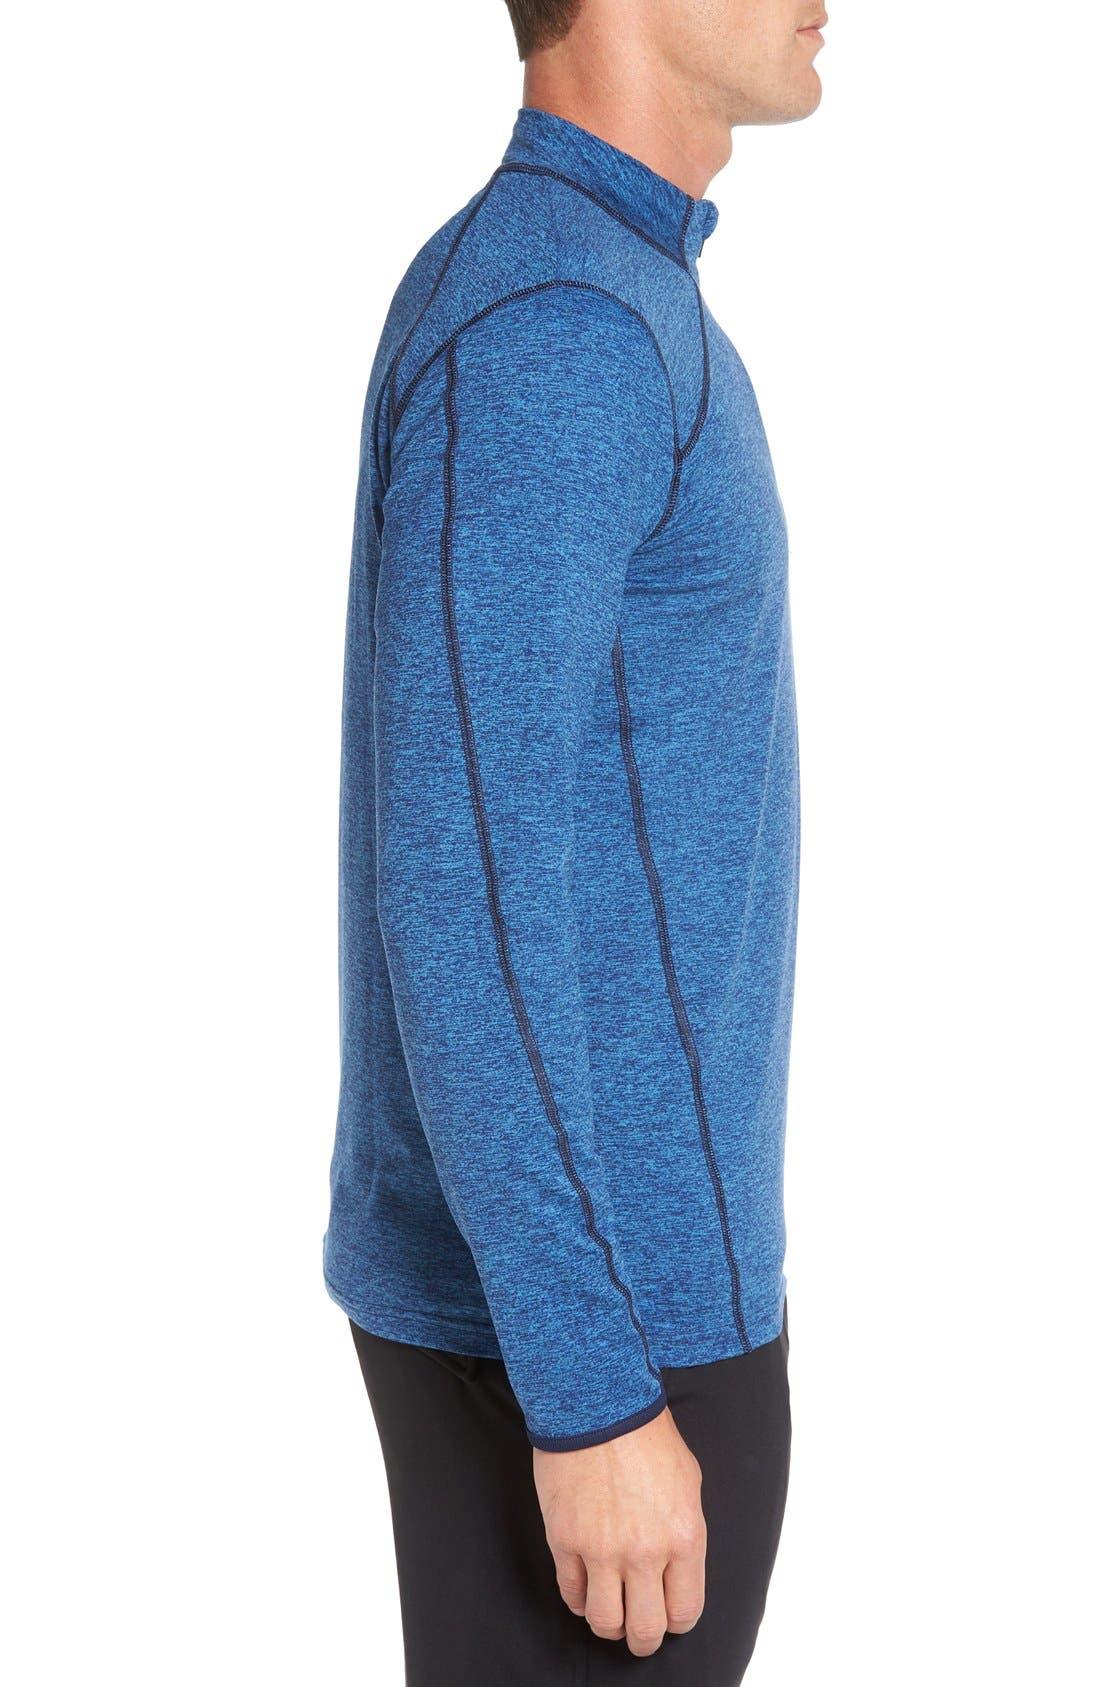 SODO, 'Elevate' Moisture Wicking Stretch Quarter Zip Pullover, Alternate thumbnail 3, color, OCEAN BLUE/ NAVY